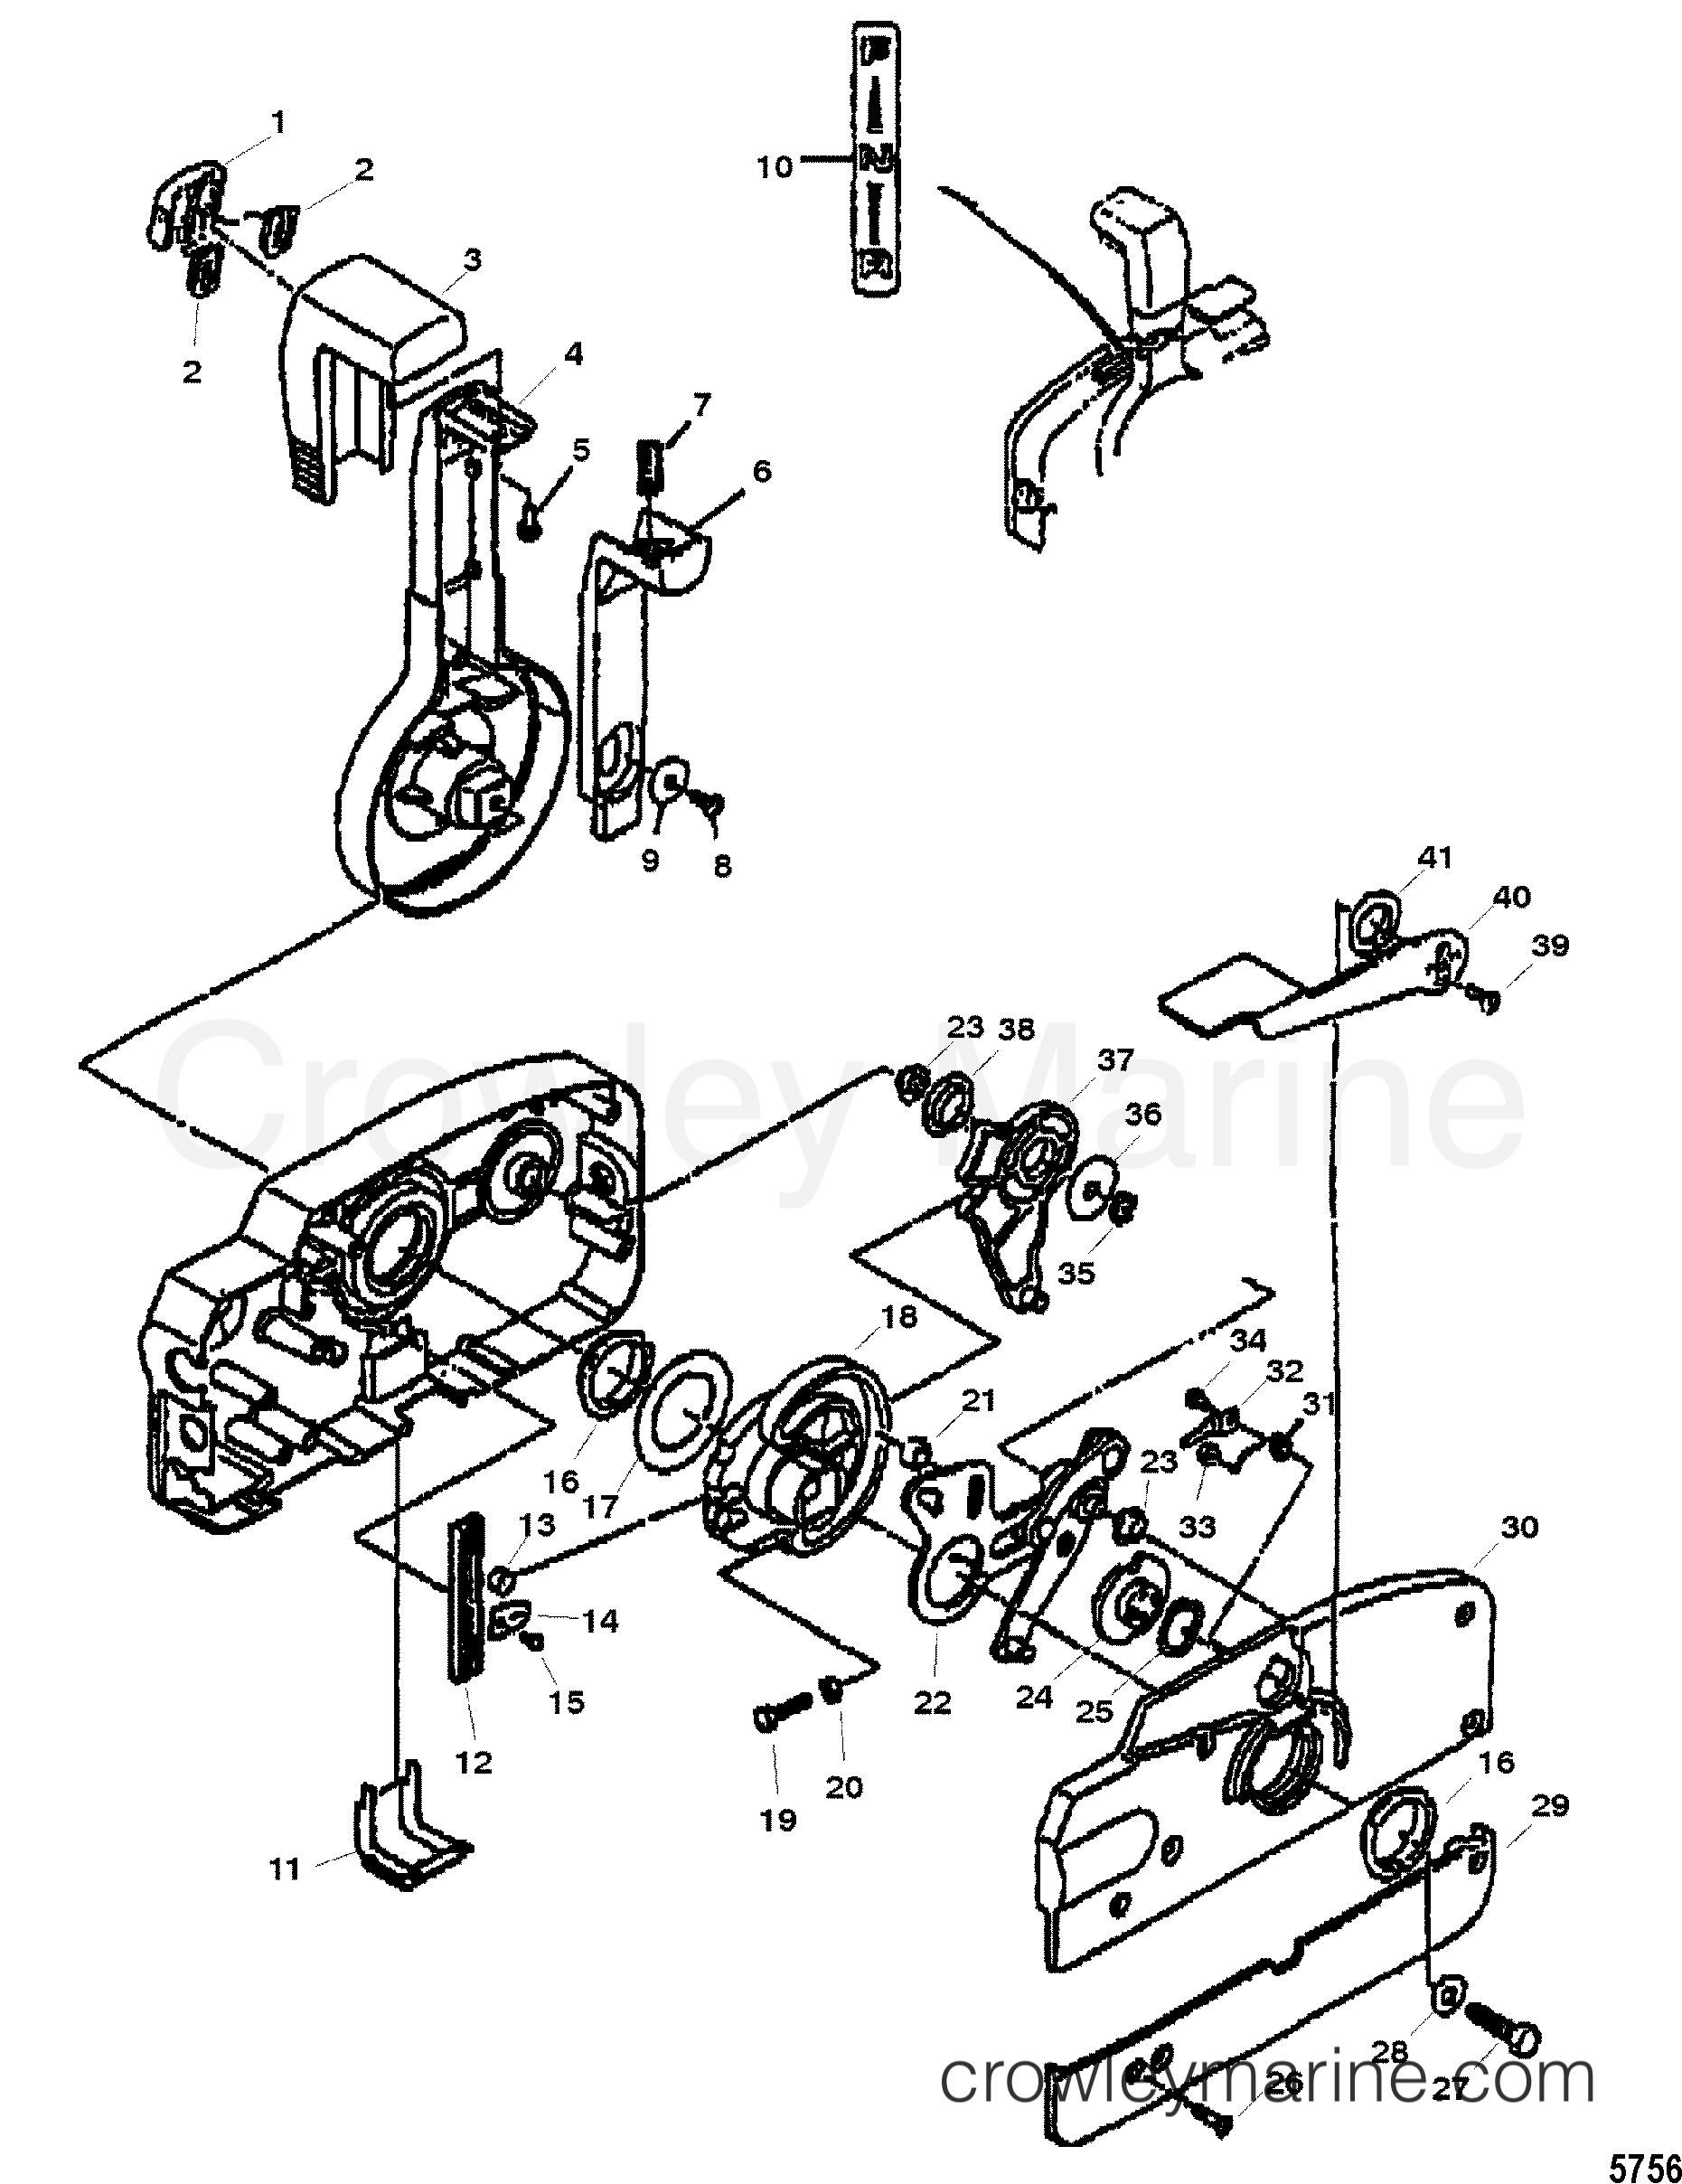 quicksilver-throttle-control-parts-diagram-10 Quicksilver Throttle Wiring Diagram on